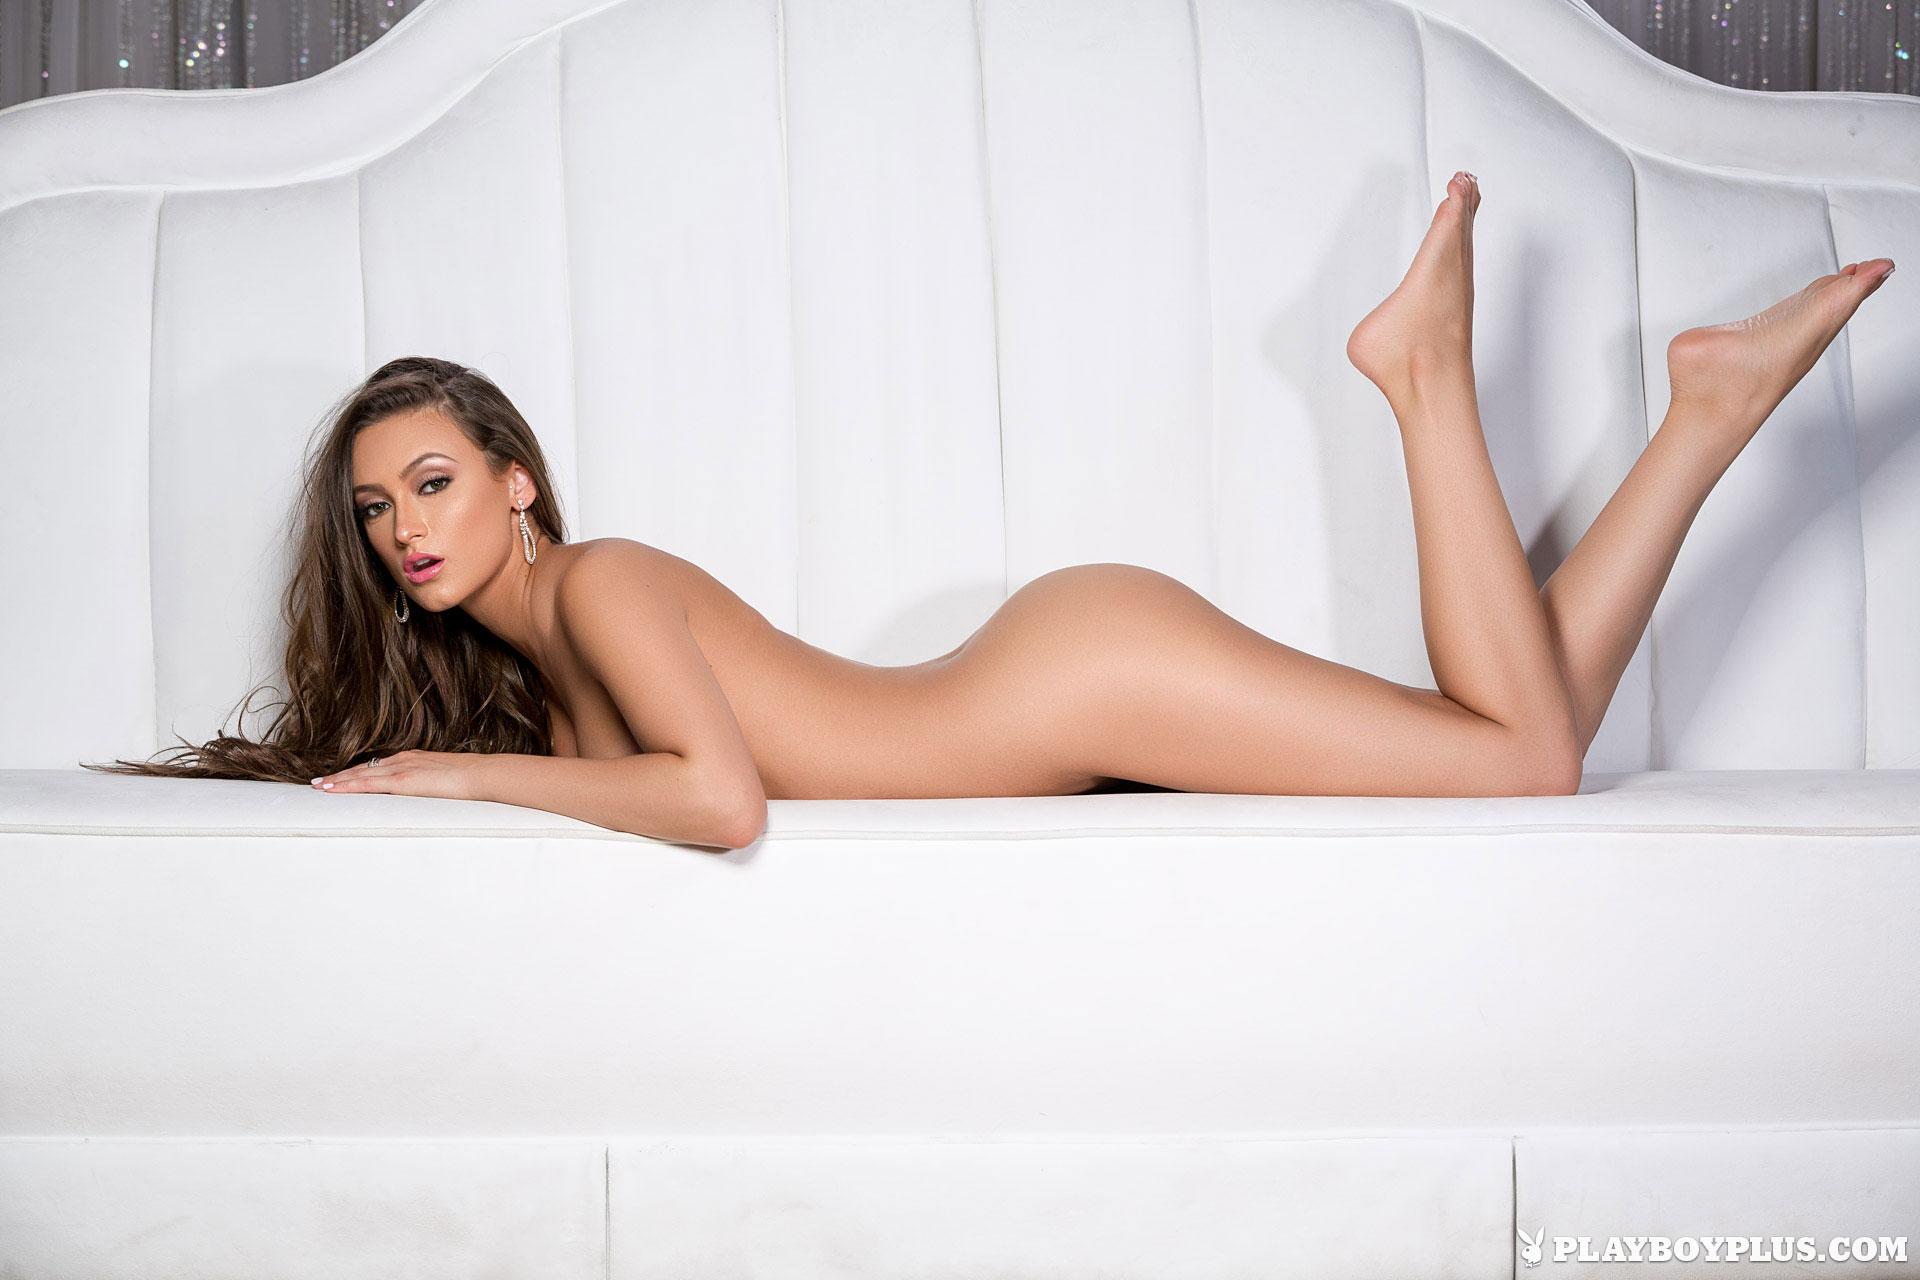 deanna-greene-stockings-garters-nude-playboy-08